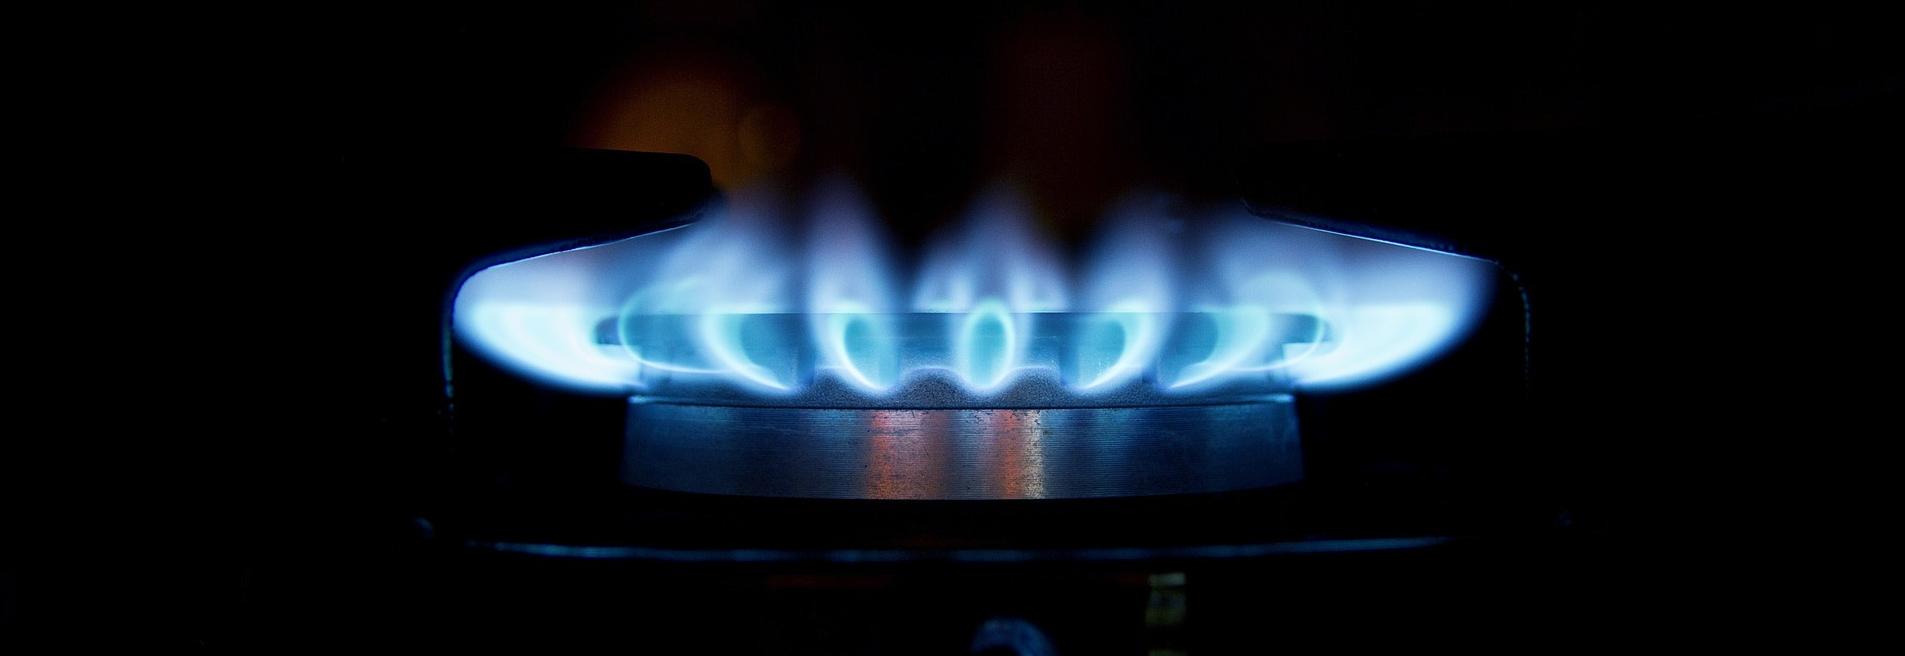 Boiler Installation North West, Merseyside